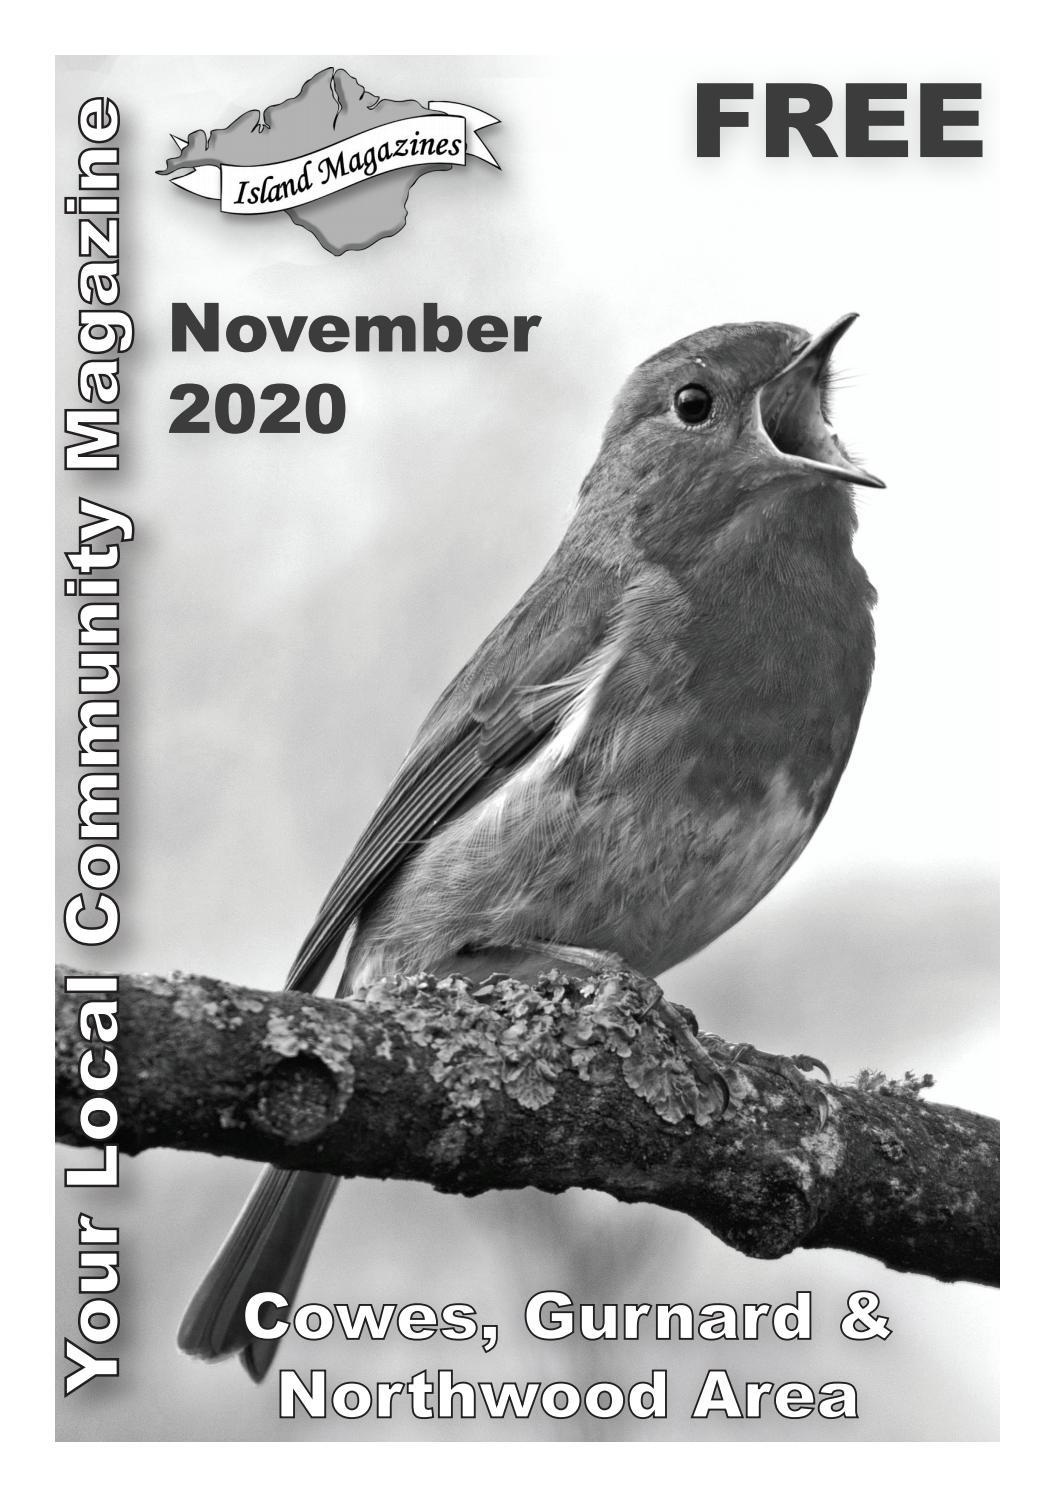 Island Magazines November 2020 Cowes Gurnard Northwood Area By Island Magazines Issuu